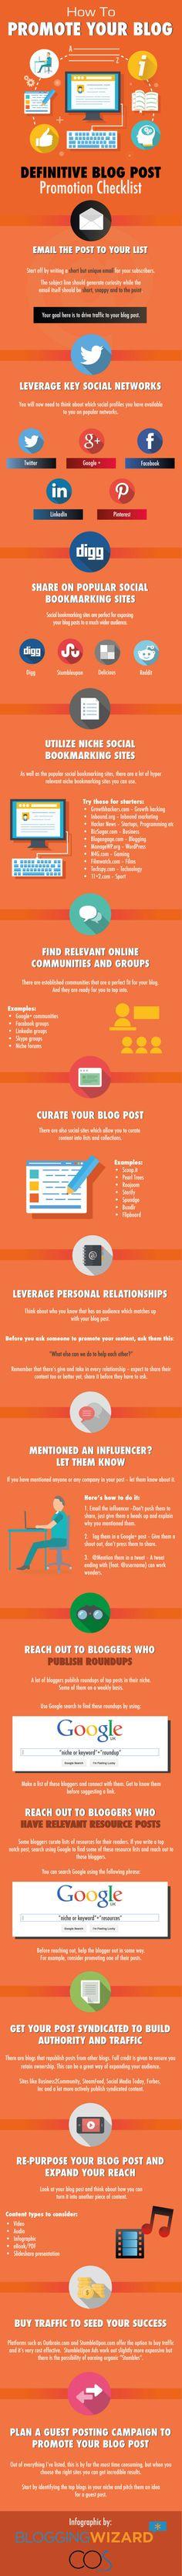 How to Promote Your Blog: The Definitive Blog Post Promotion Checklist | Red Website Design Blog